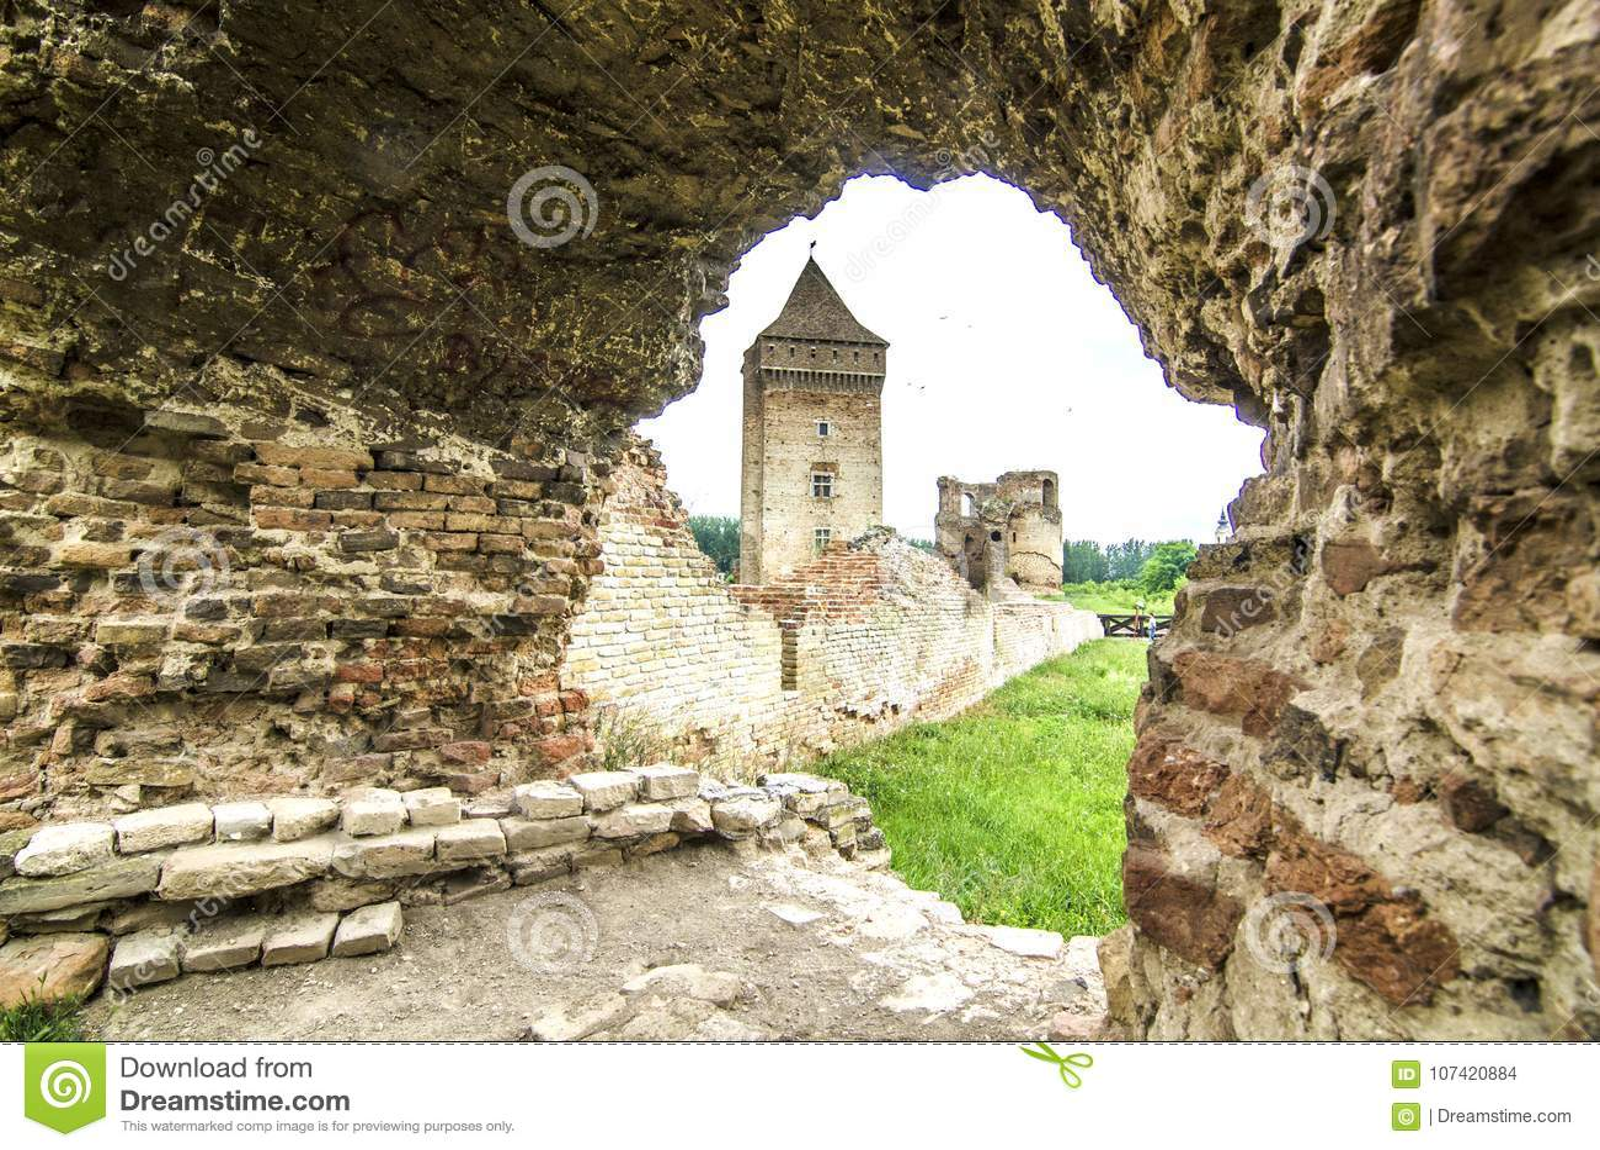 Old rustic castle